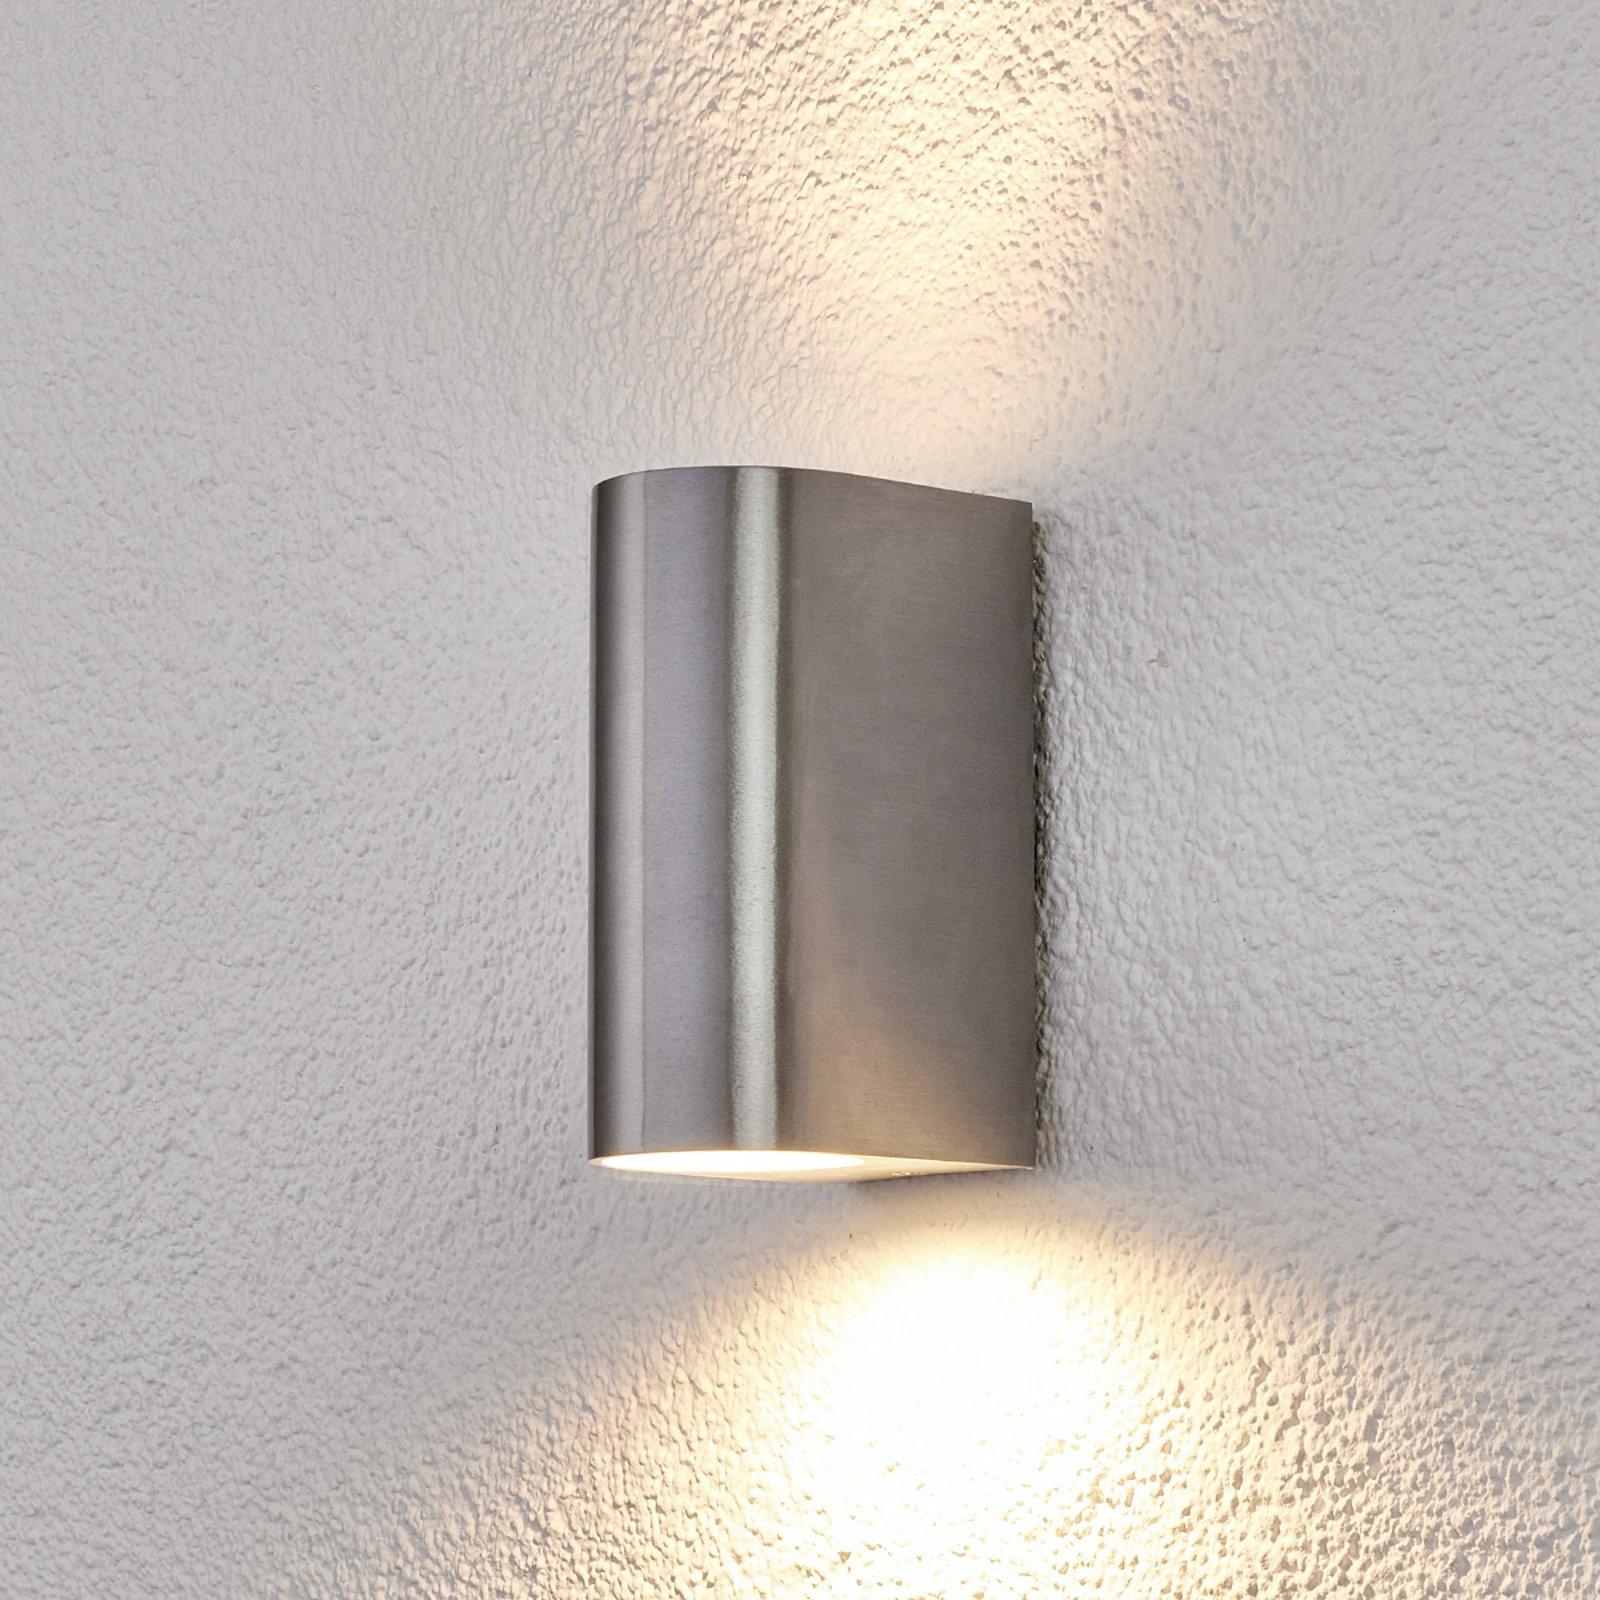 Utevegglampe Idris av aluminium med to lys